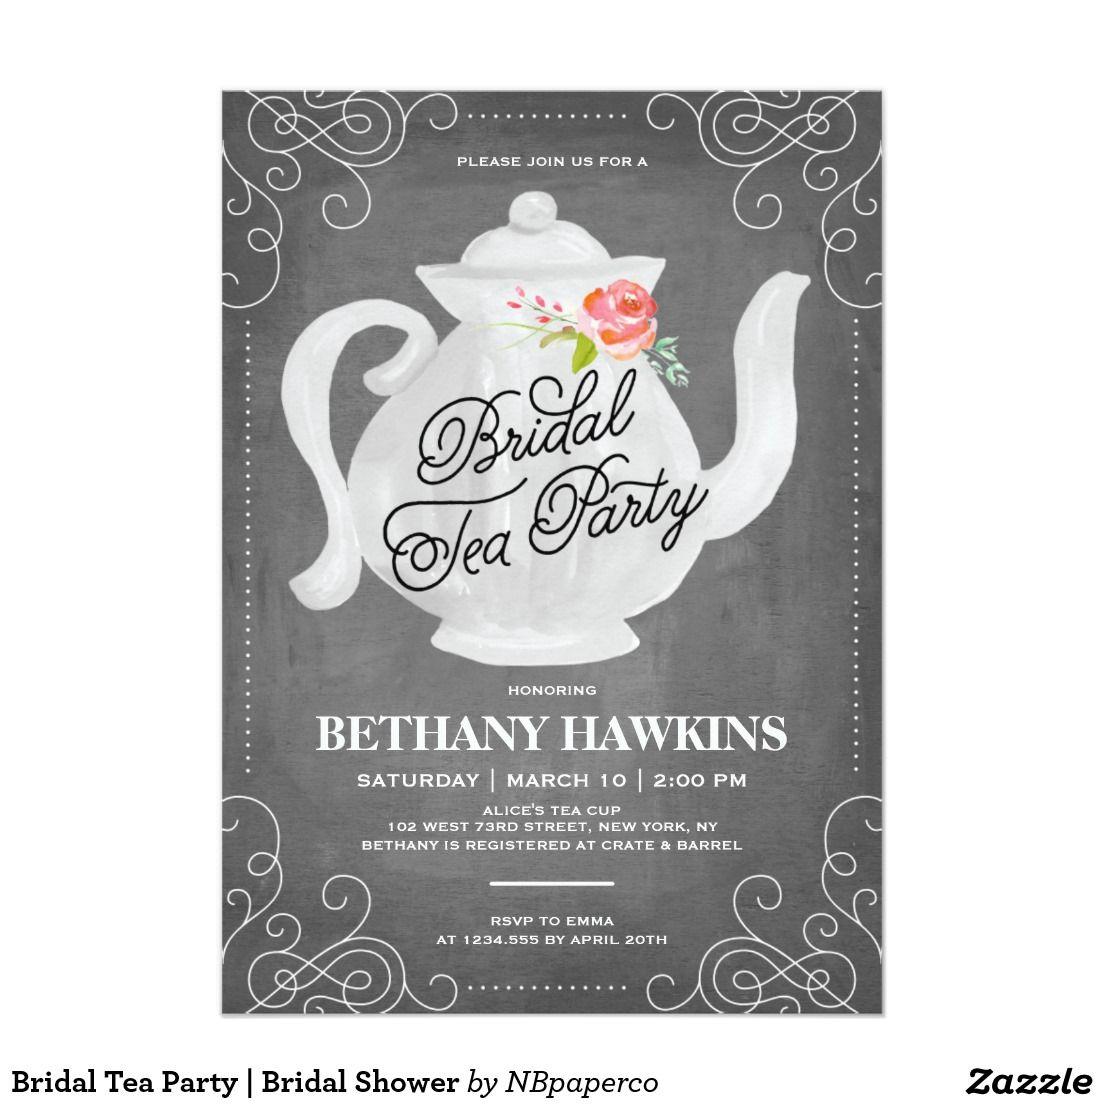 Bridal tea party bridal shower card bridal showers tea parties bridal tea party bridal shower 5x7 paper invitation card stopboris Image collections